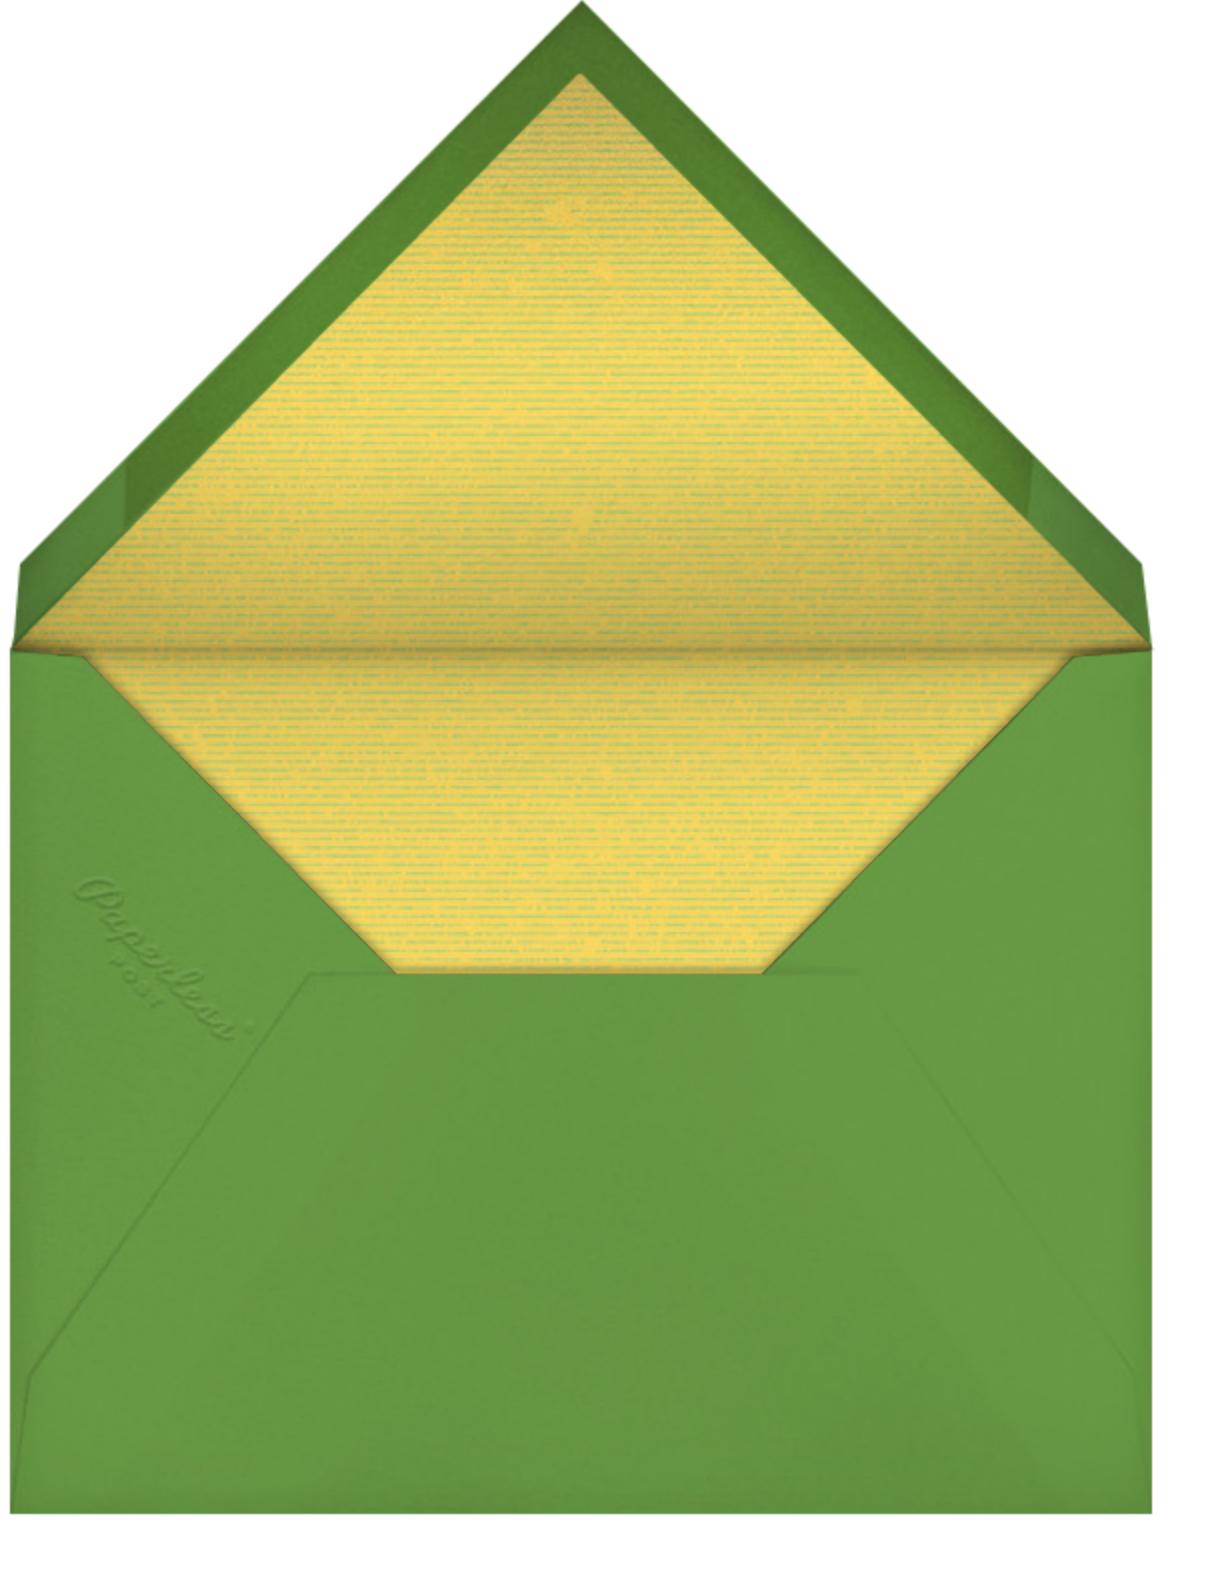 Tee Time - Paperless Post - Adult birthday - envelope back